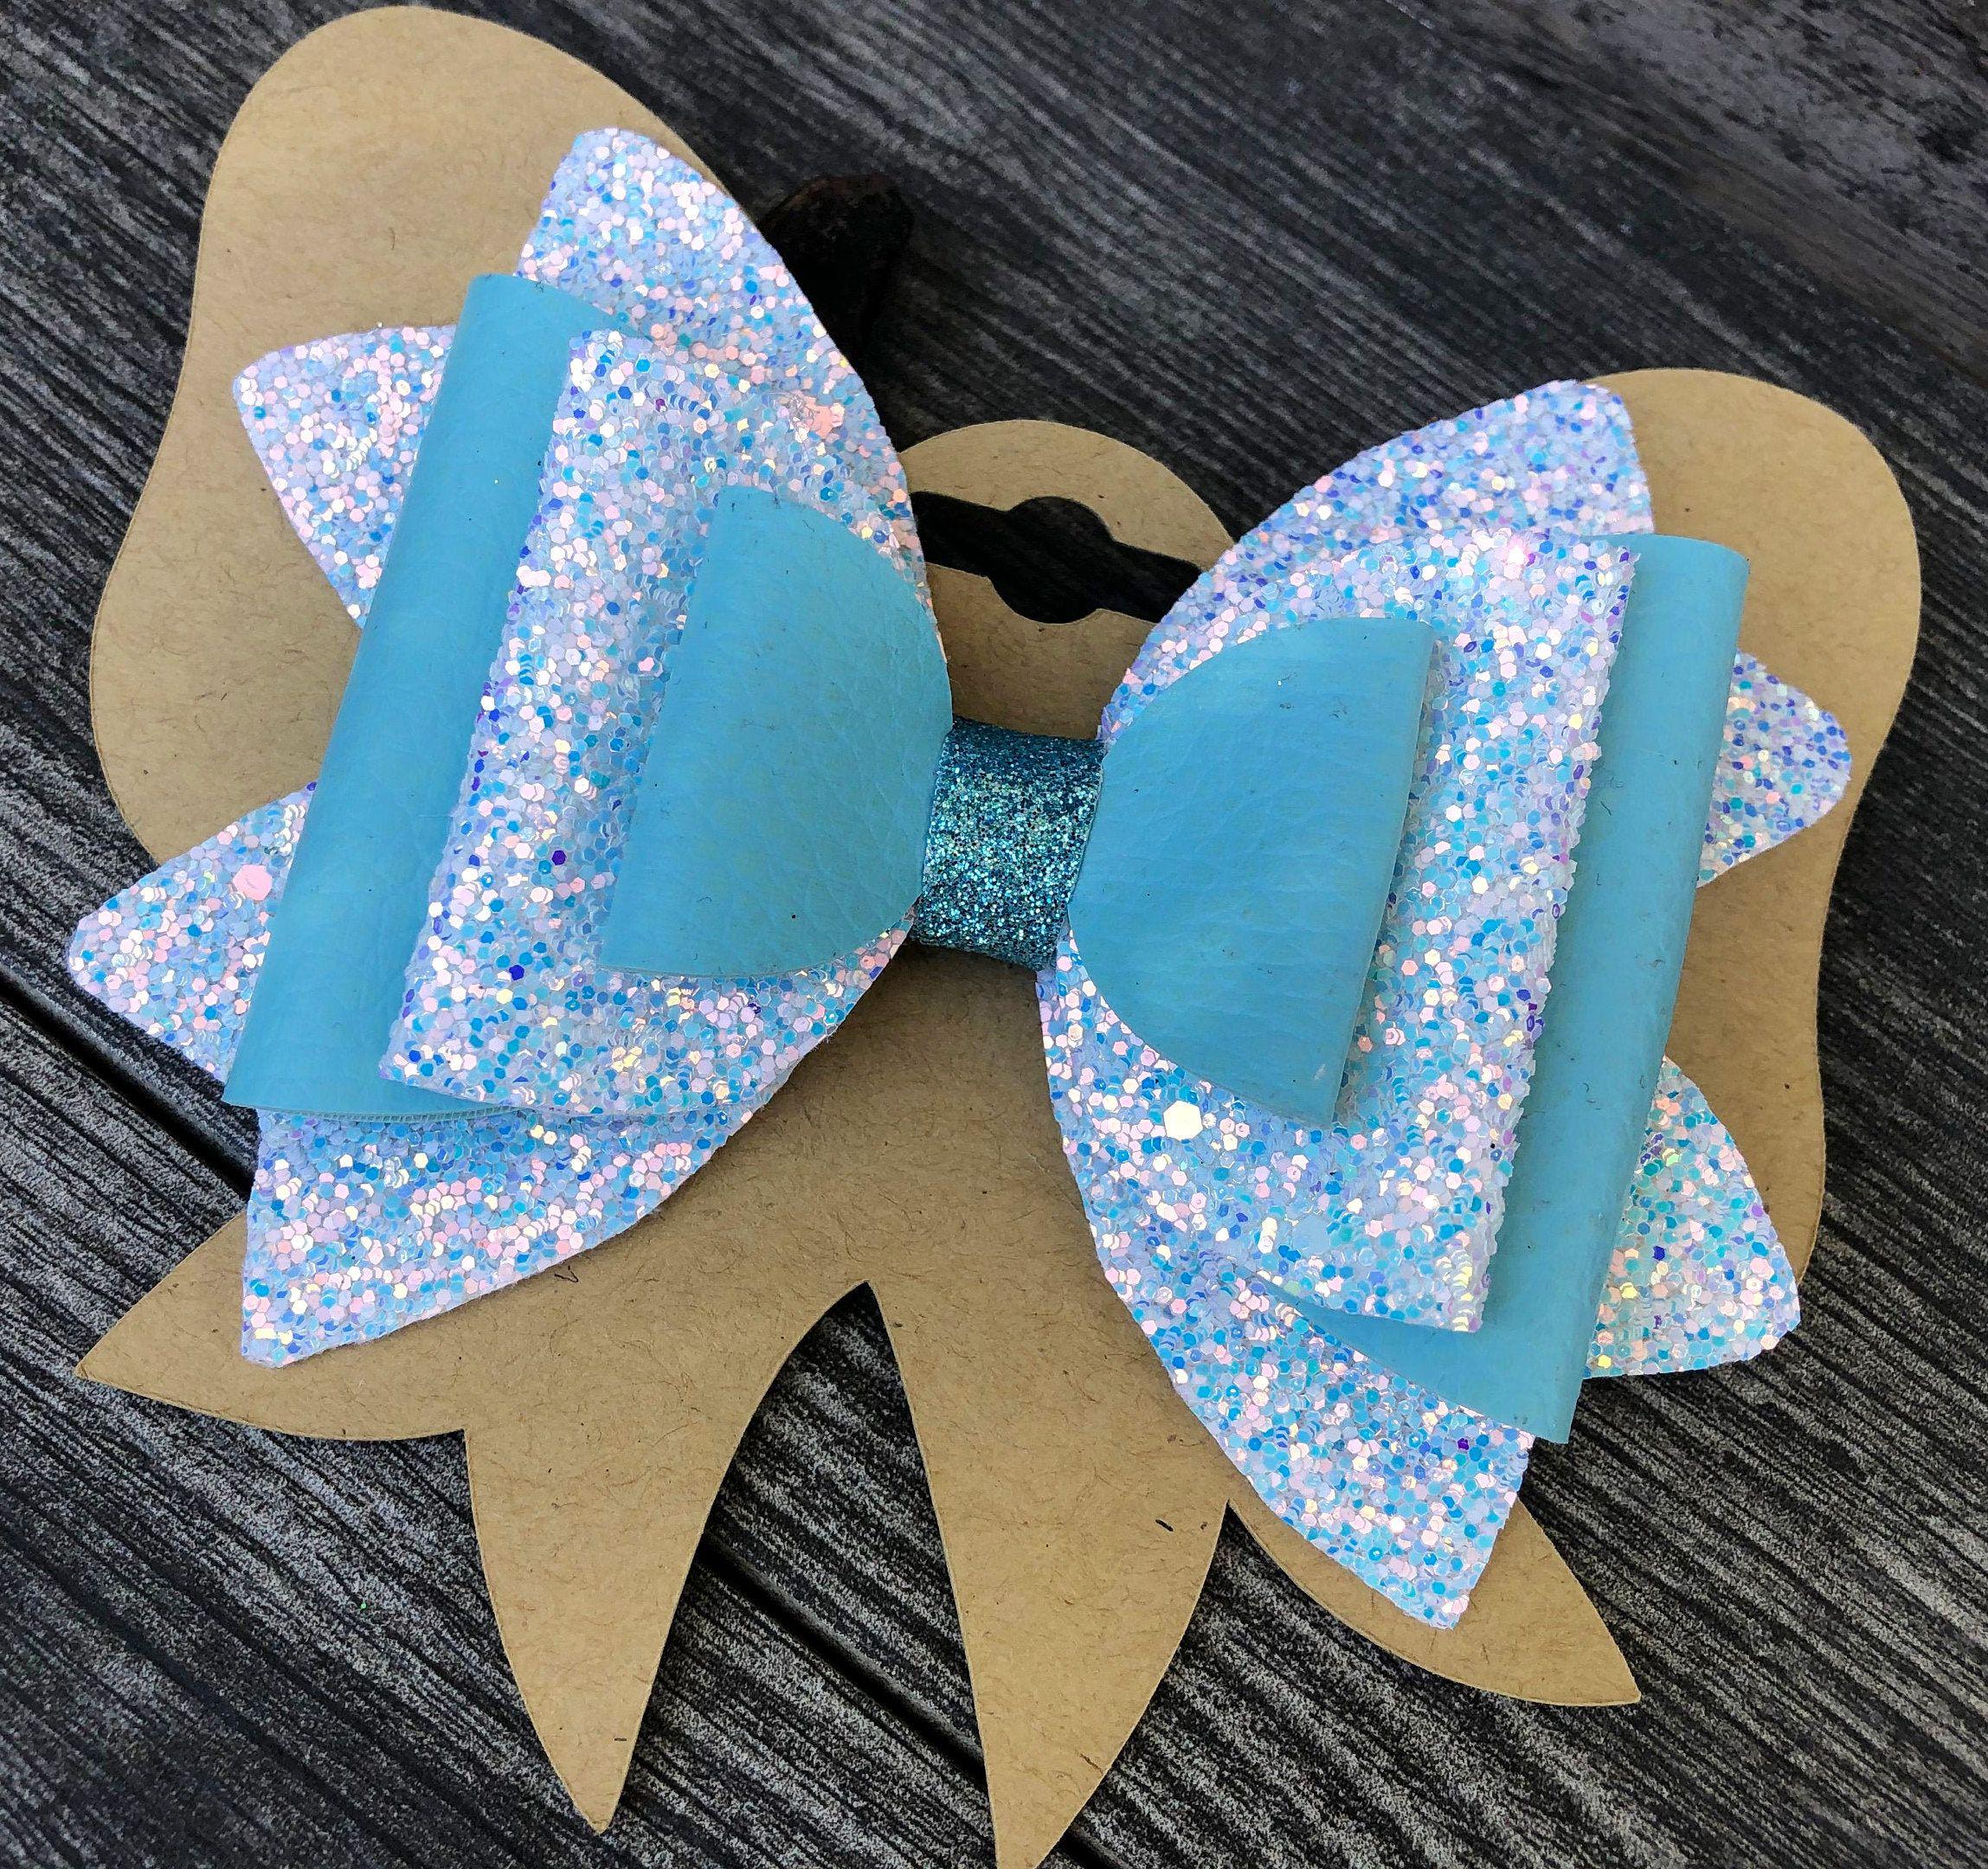 girls hair bow glitter hair bows baby girl headbands baby hair bows hair clips Blue hair bow